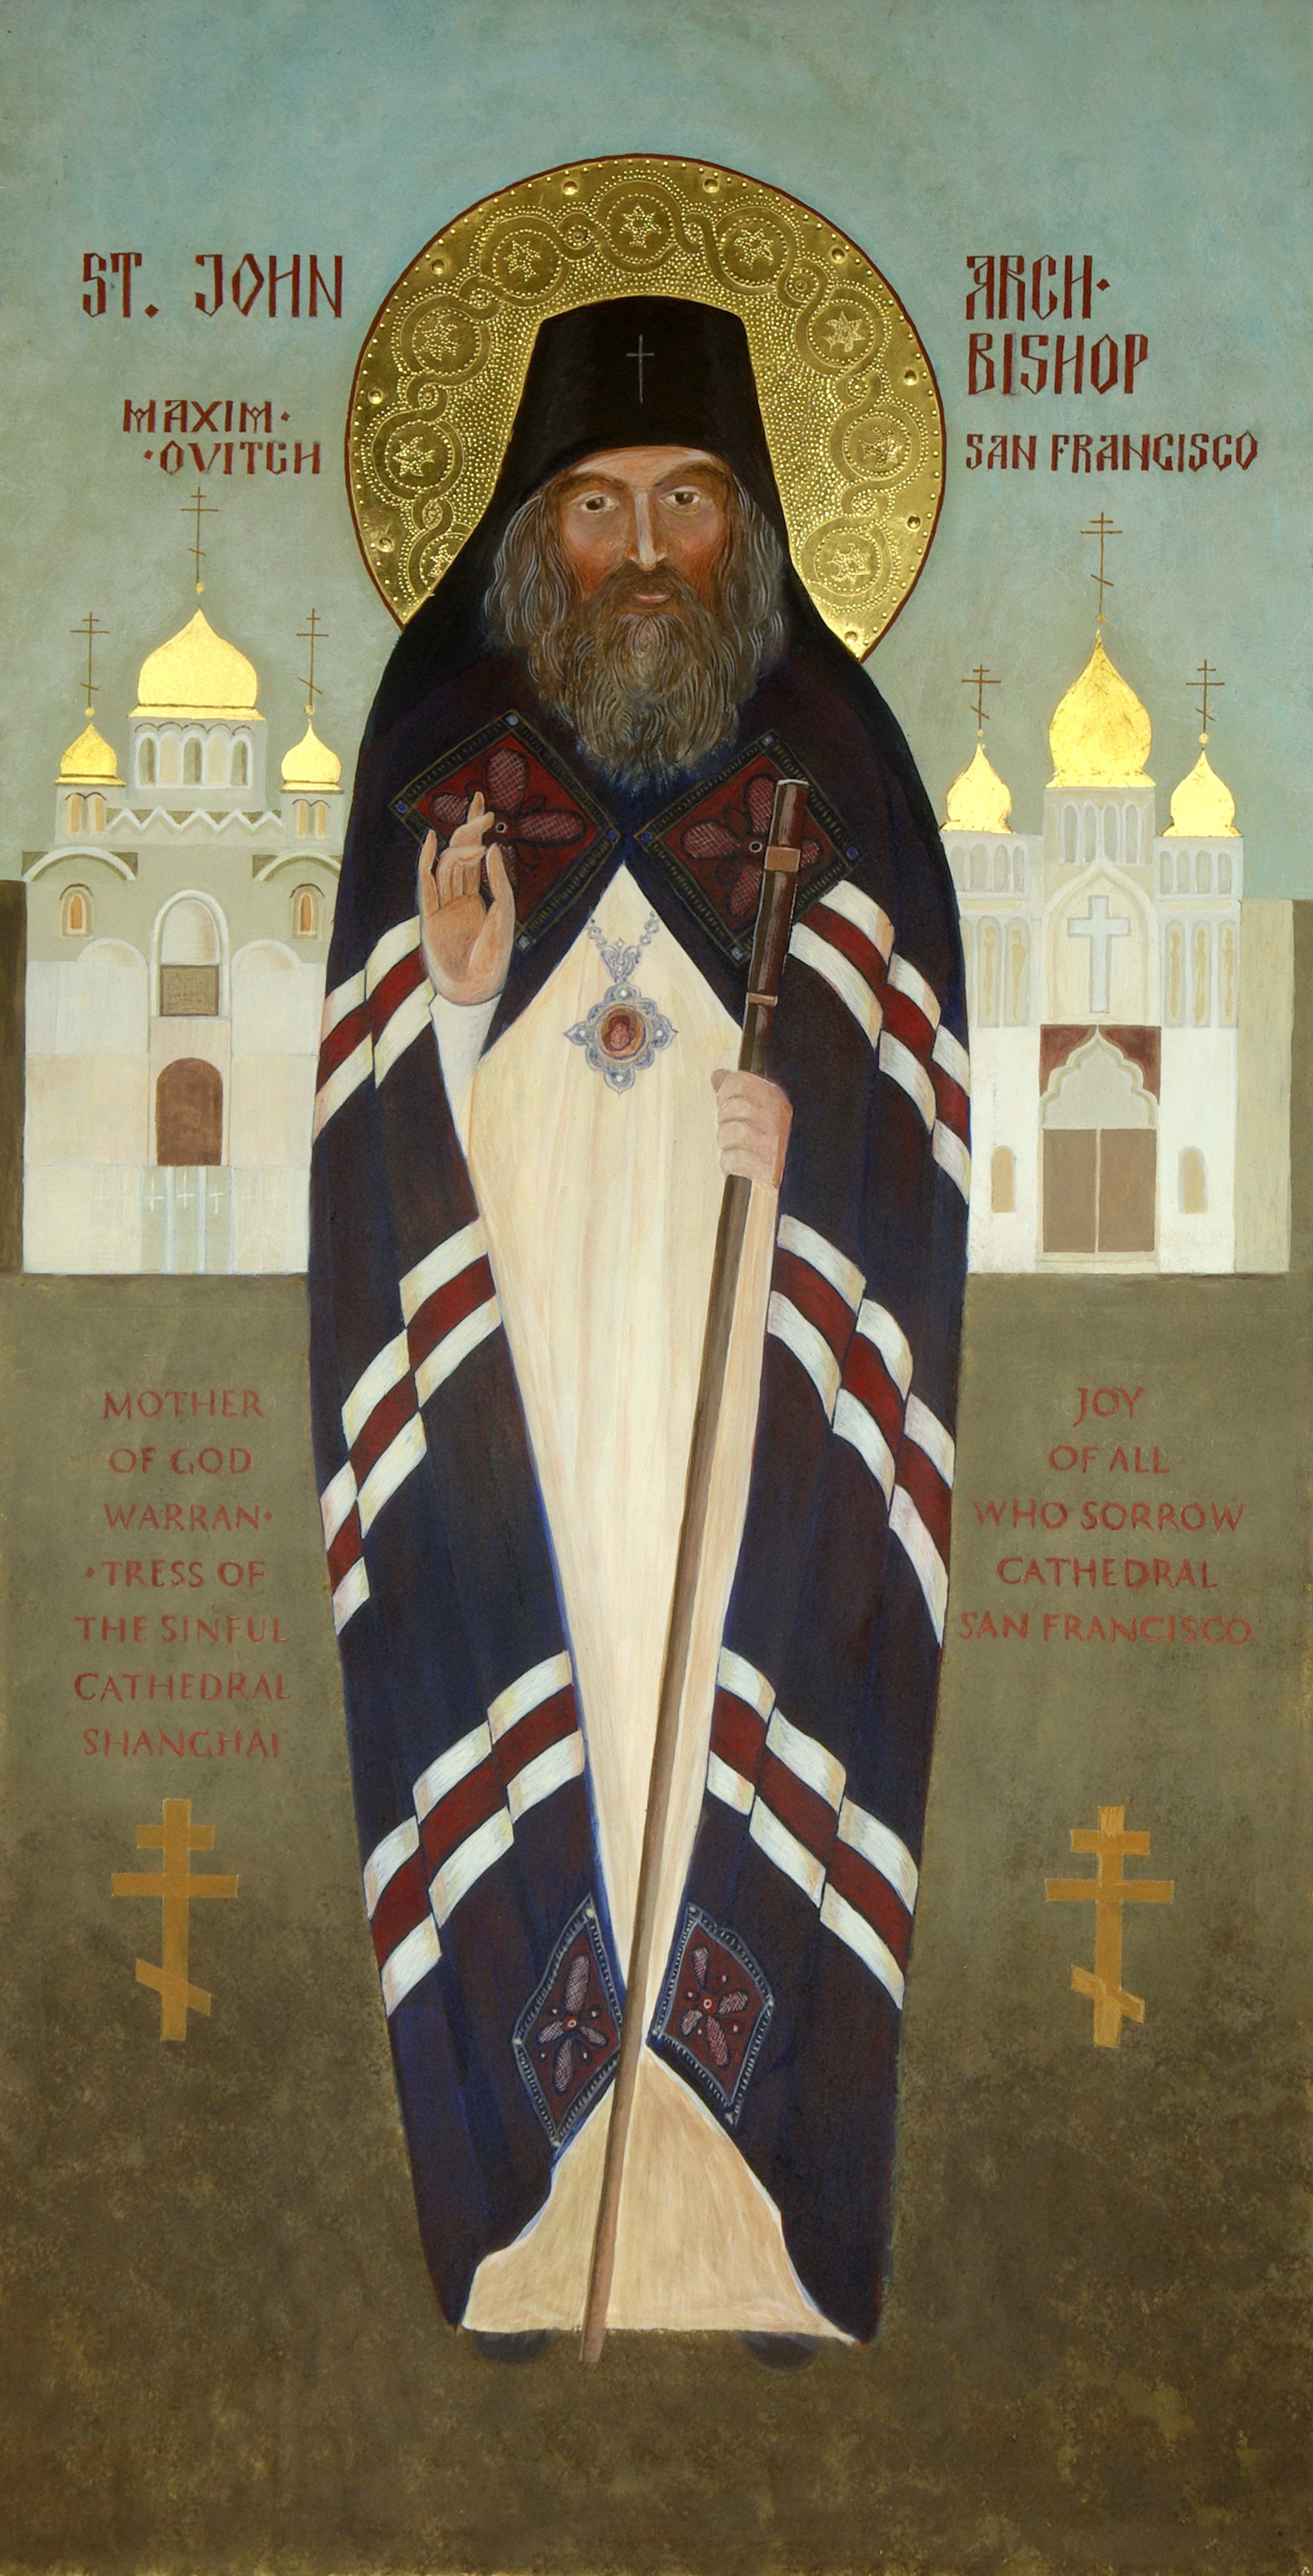 St John Maximovitch.jpg